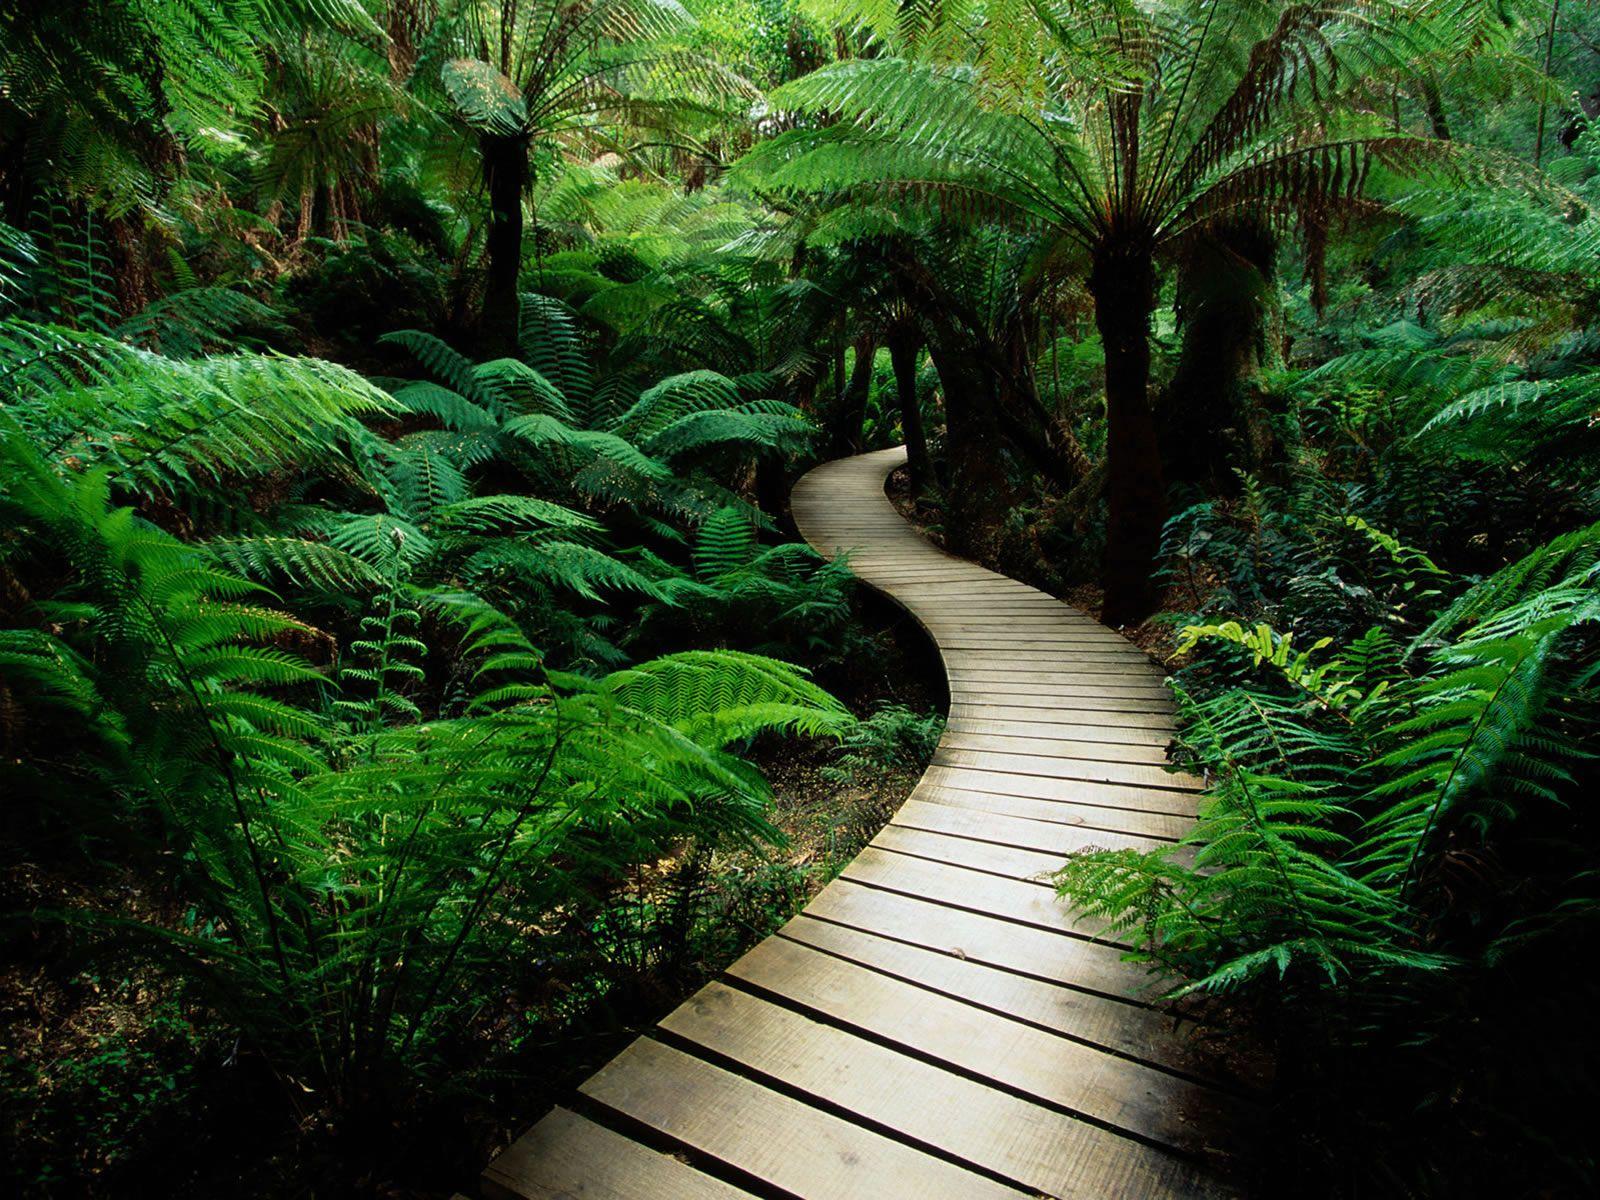 Best 25+ 3d images of nature ideas on Pinterest | Define fold ...